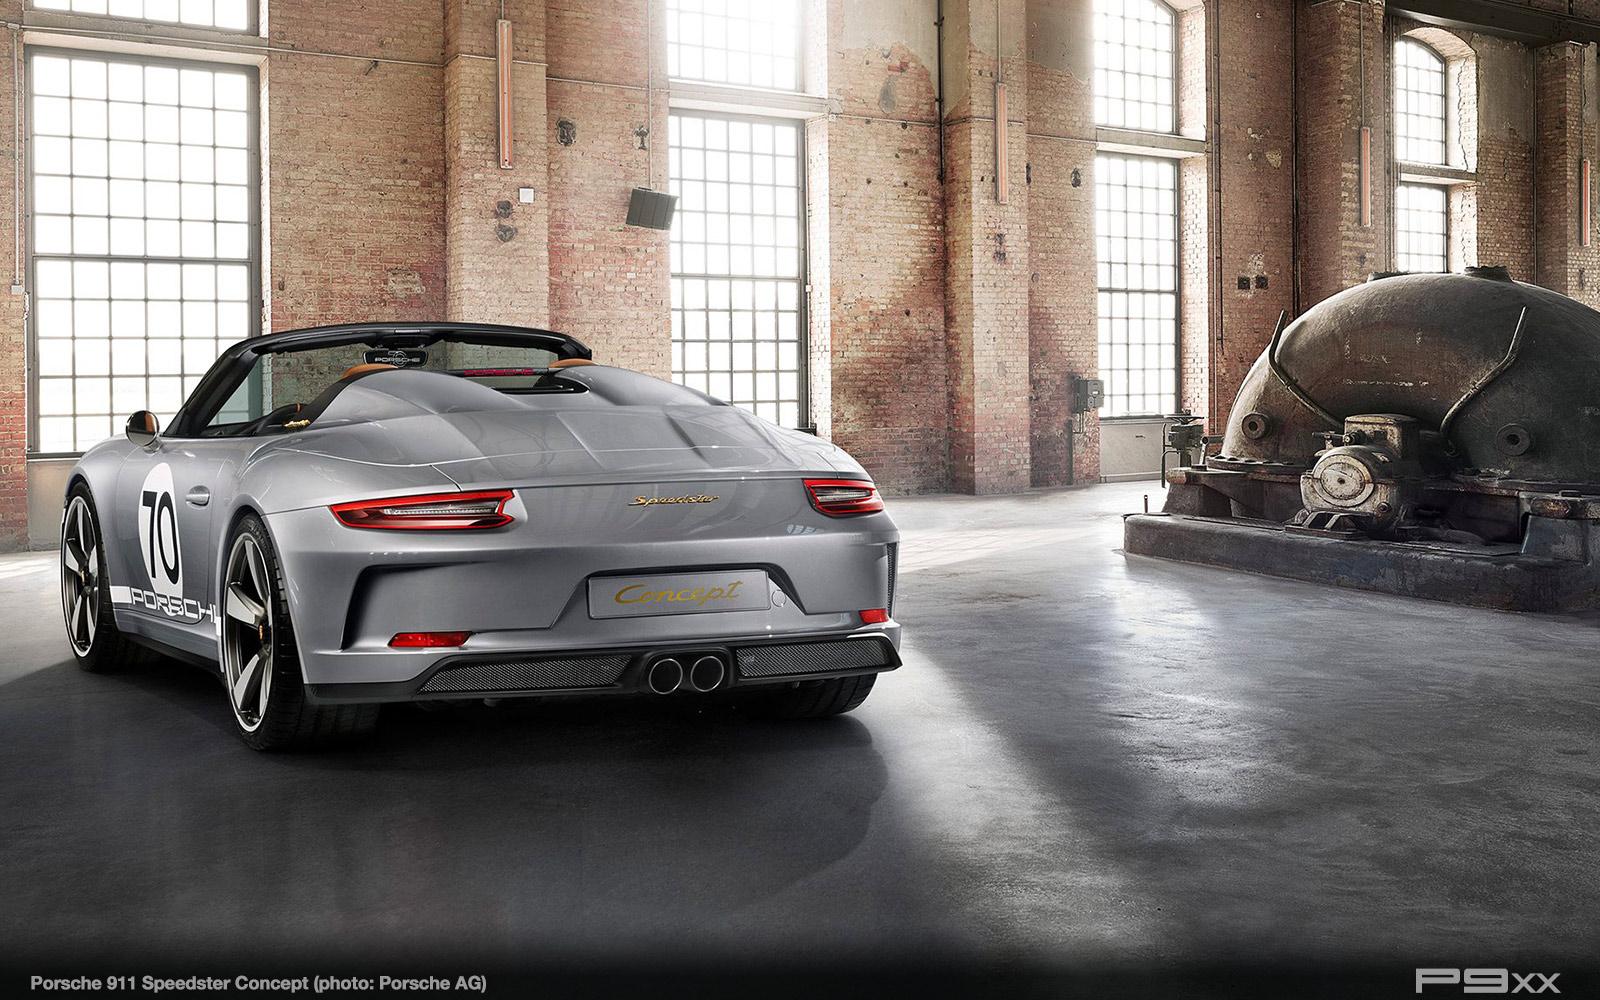 Porsche-911-Speedster-Concept-2018-297